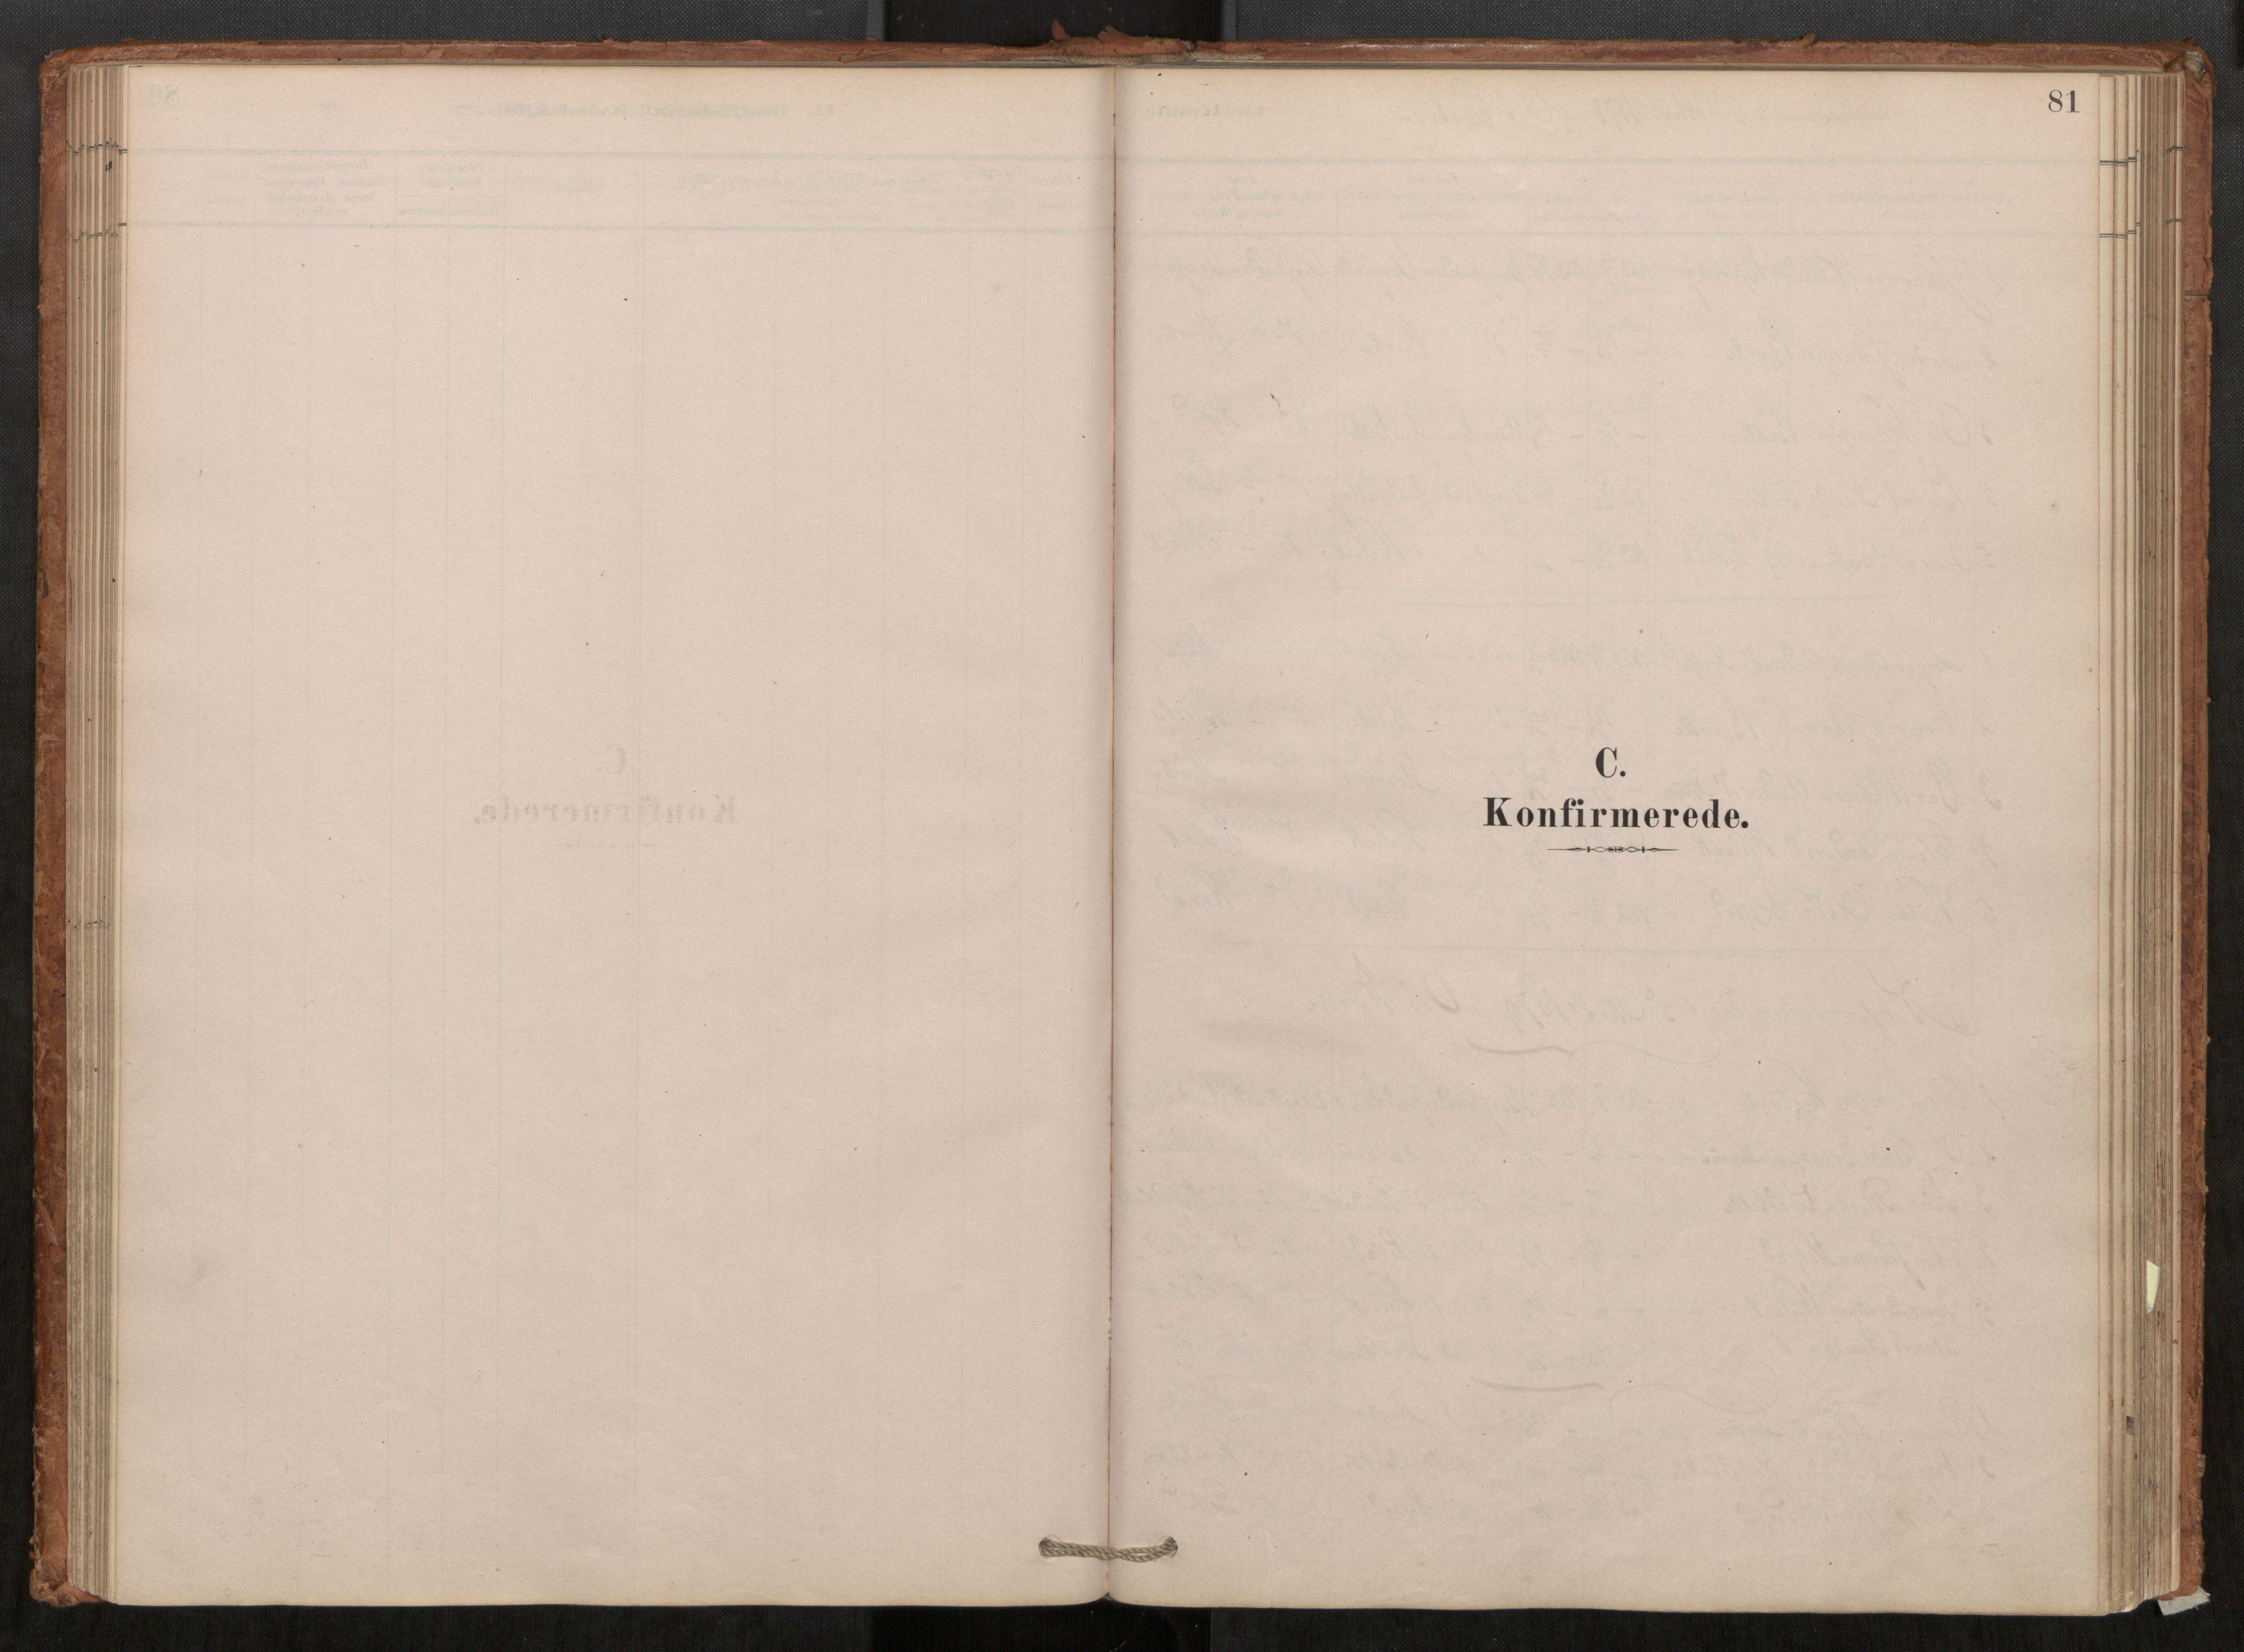 SAT, Grytten sokneprestkontor, Ministerialbok nr. 550A01, 1878-1915, s. 81